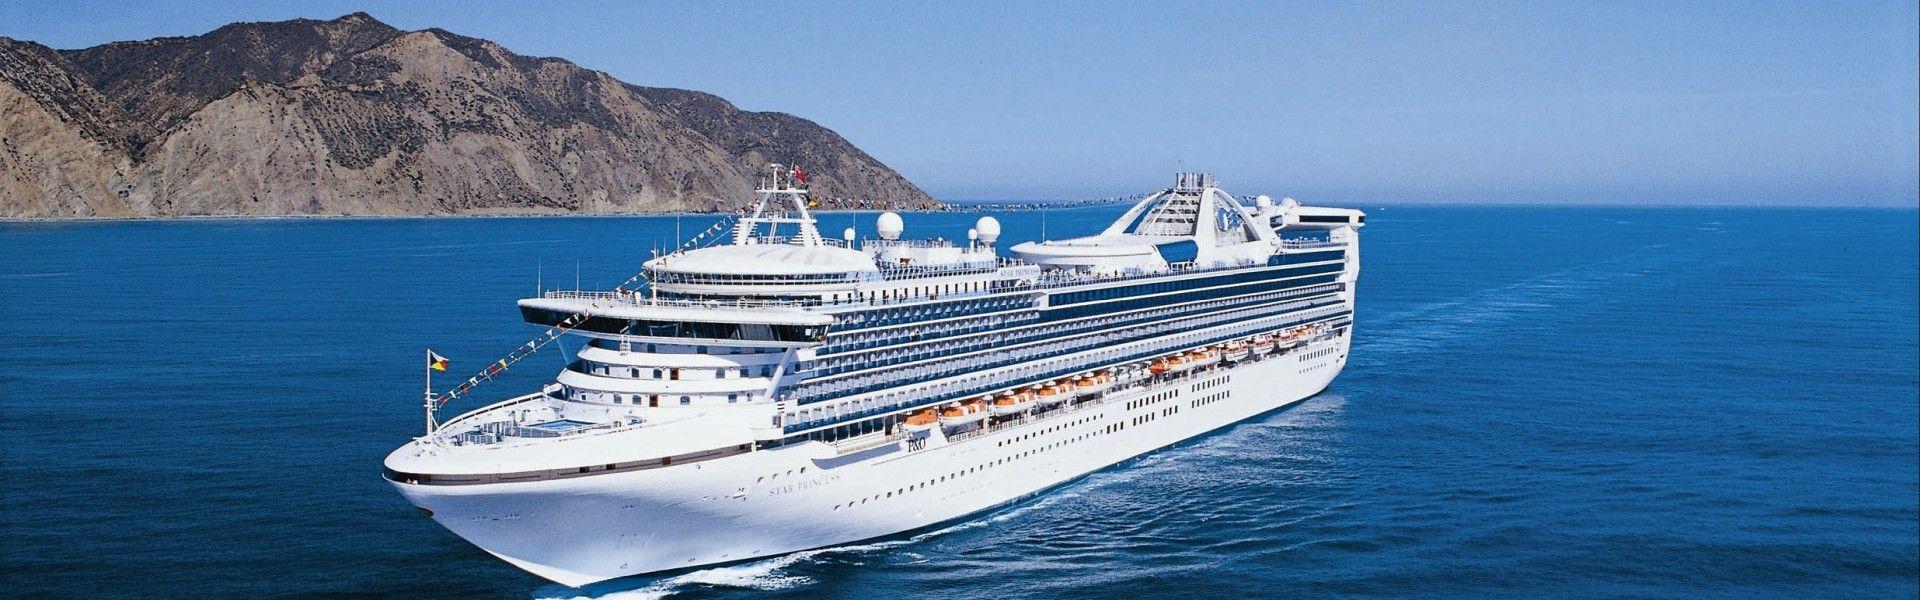 Croaziera 2019 - America de Sud (Valparaiso) - Princess Cruises - Star Princess - 16 nopti